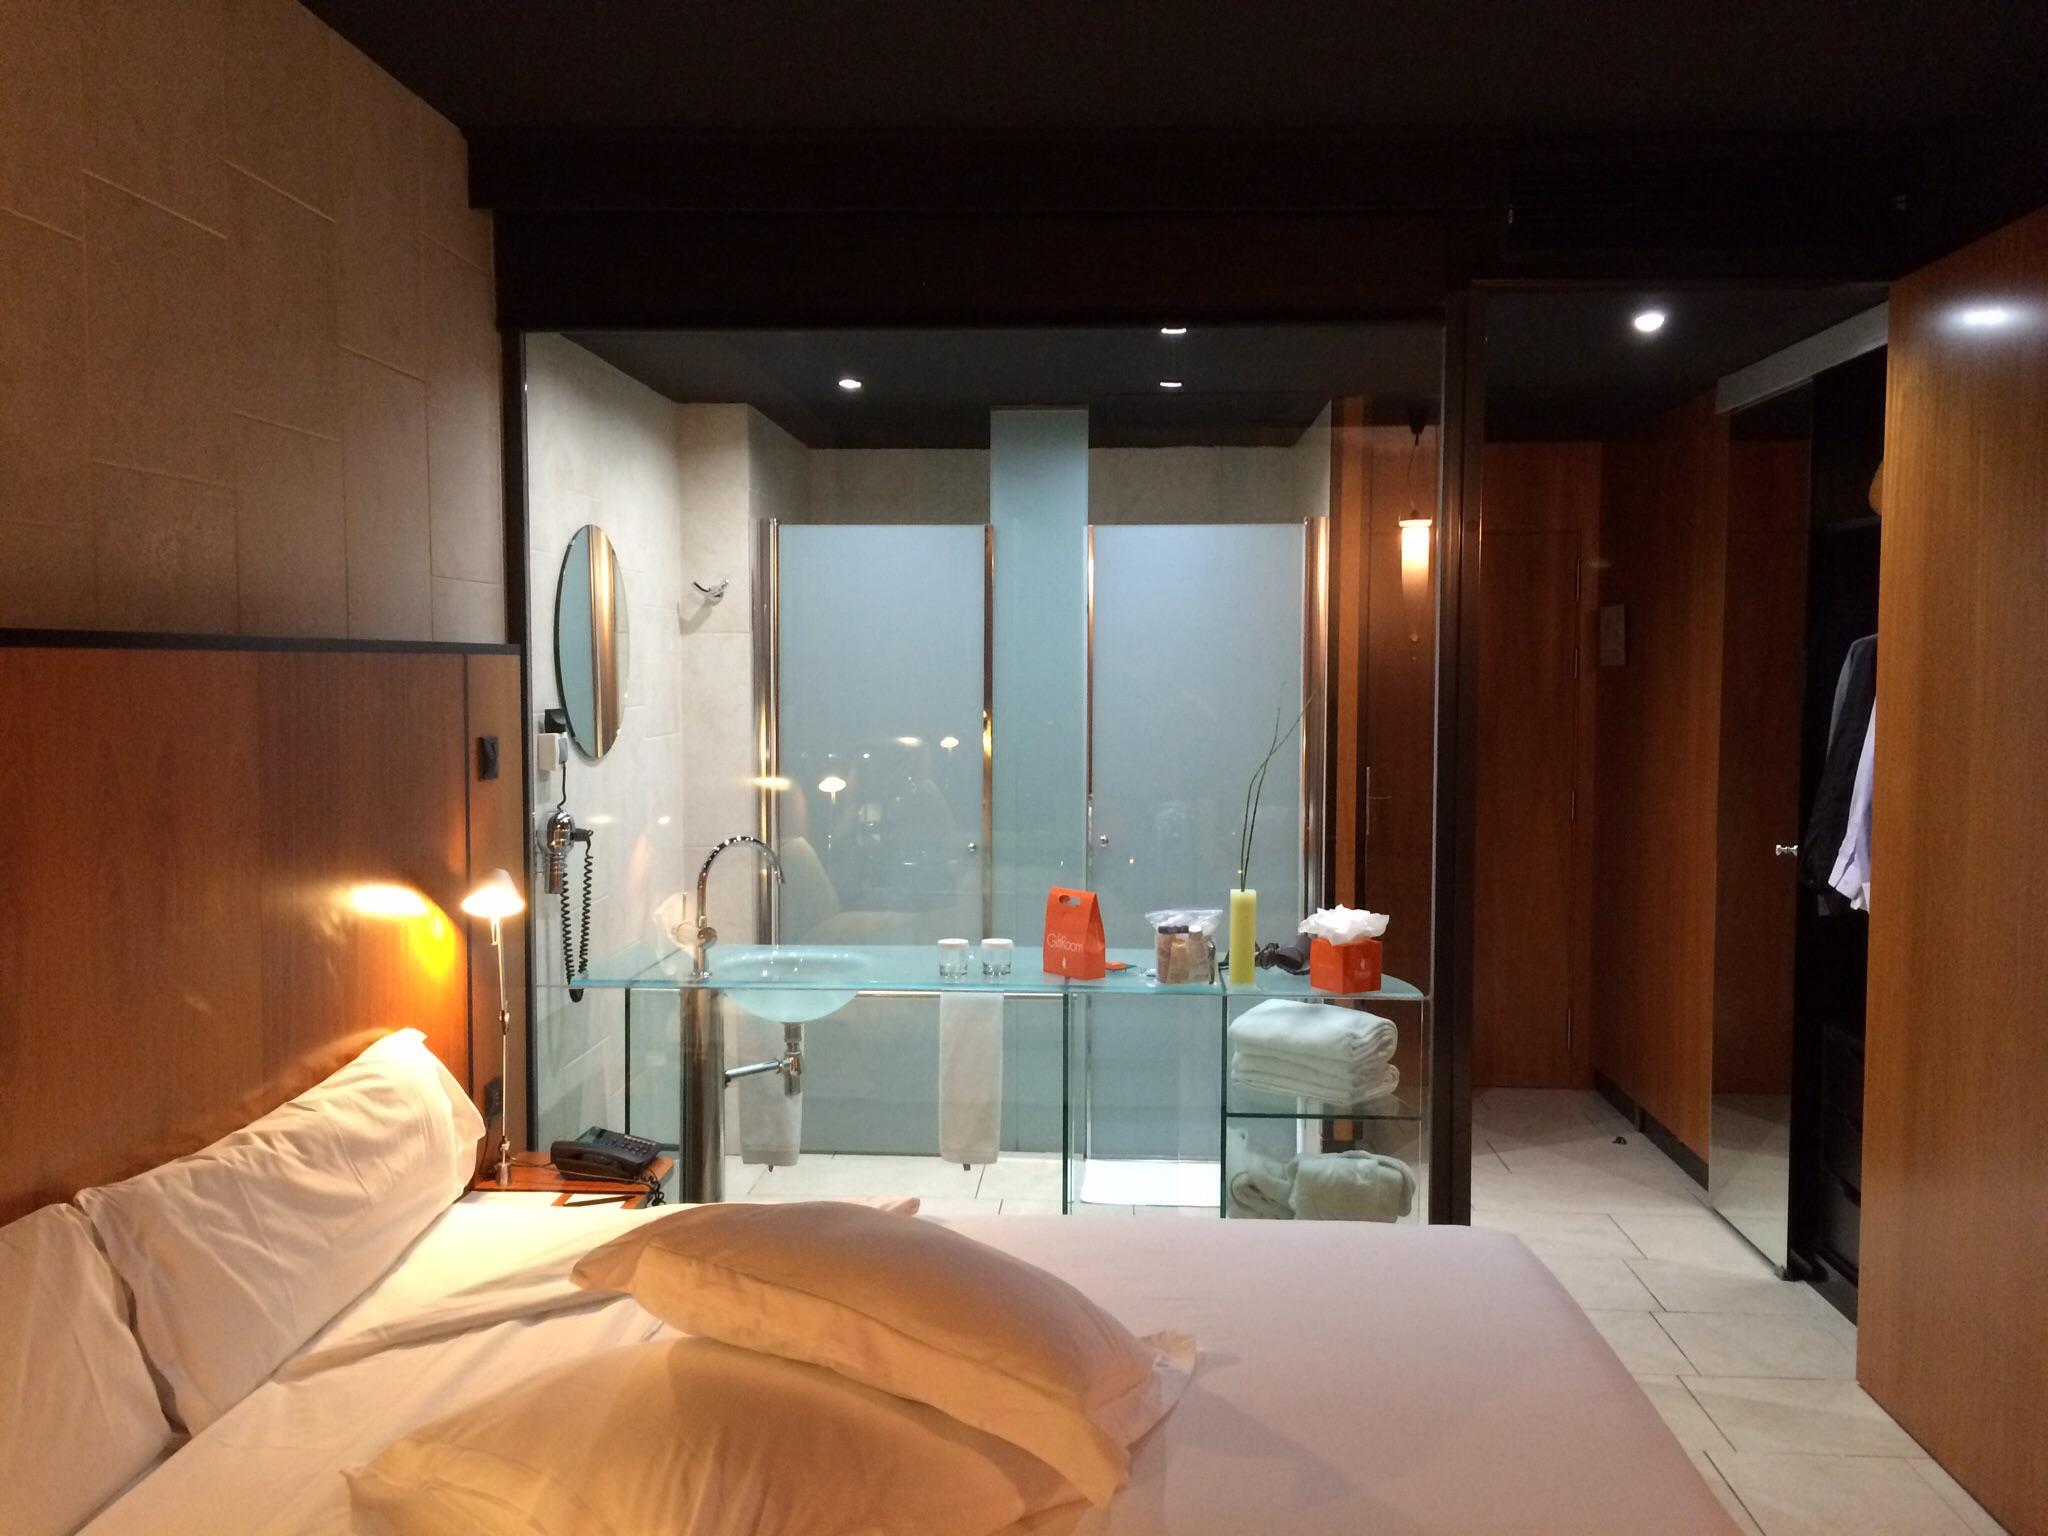 Hotel | Reijosfood